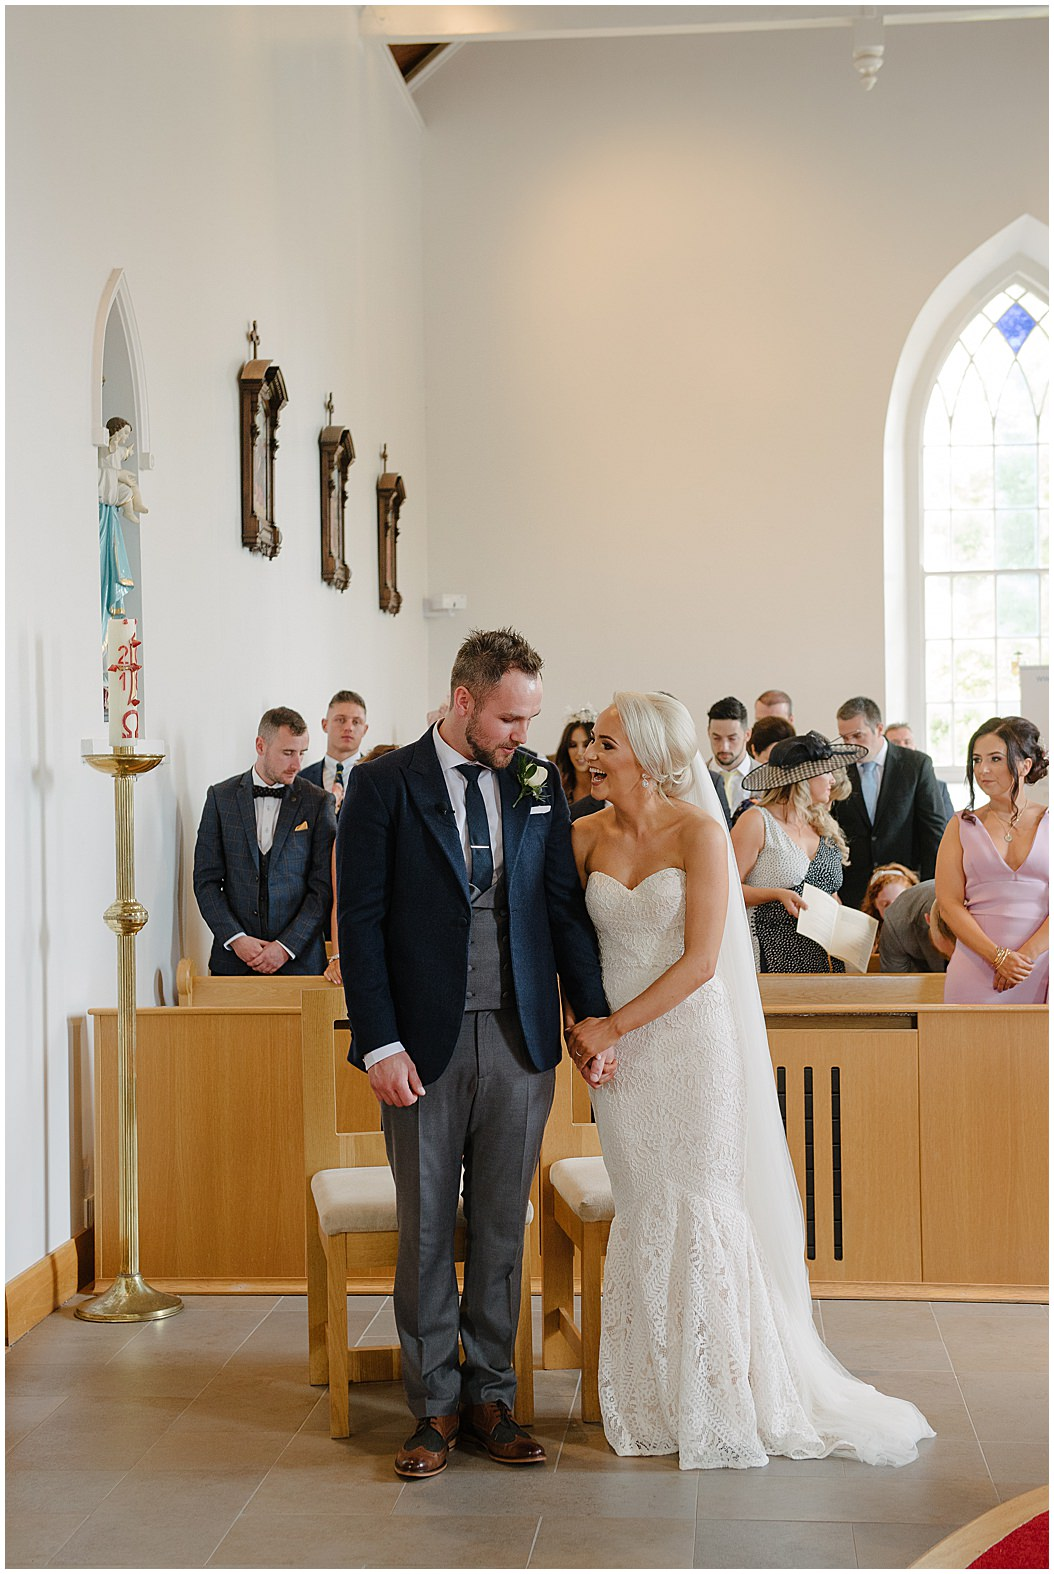 tempo-manor-wedding-jude-browne-photography_0065.jpg